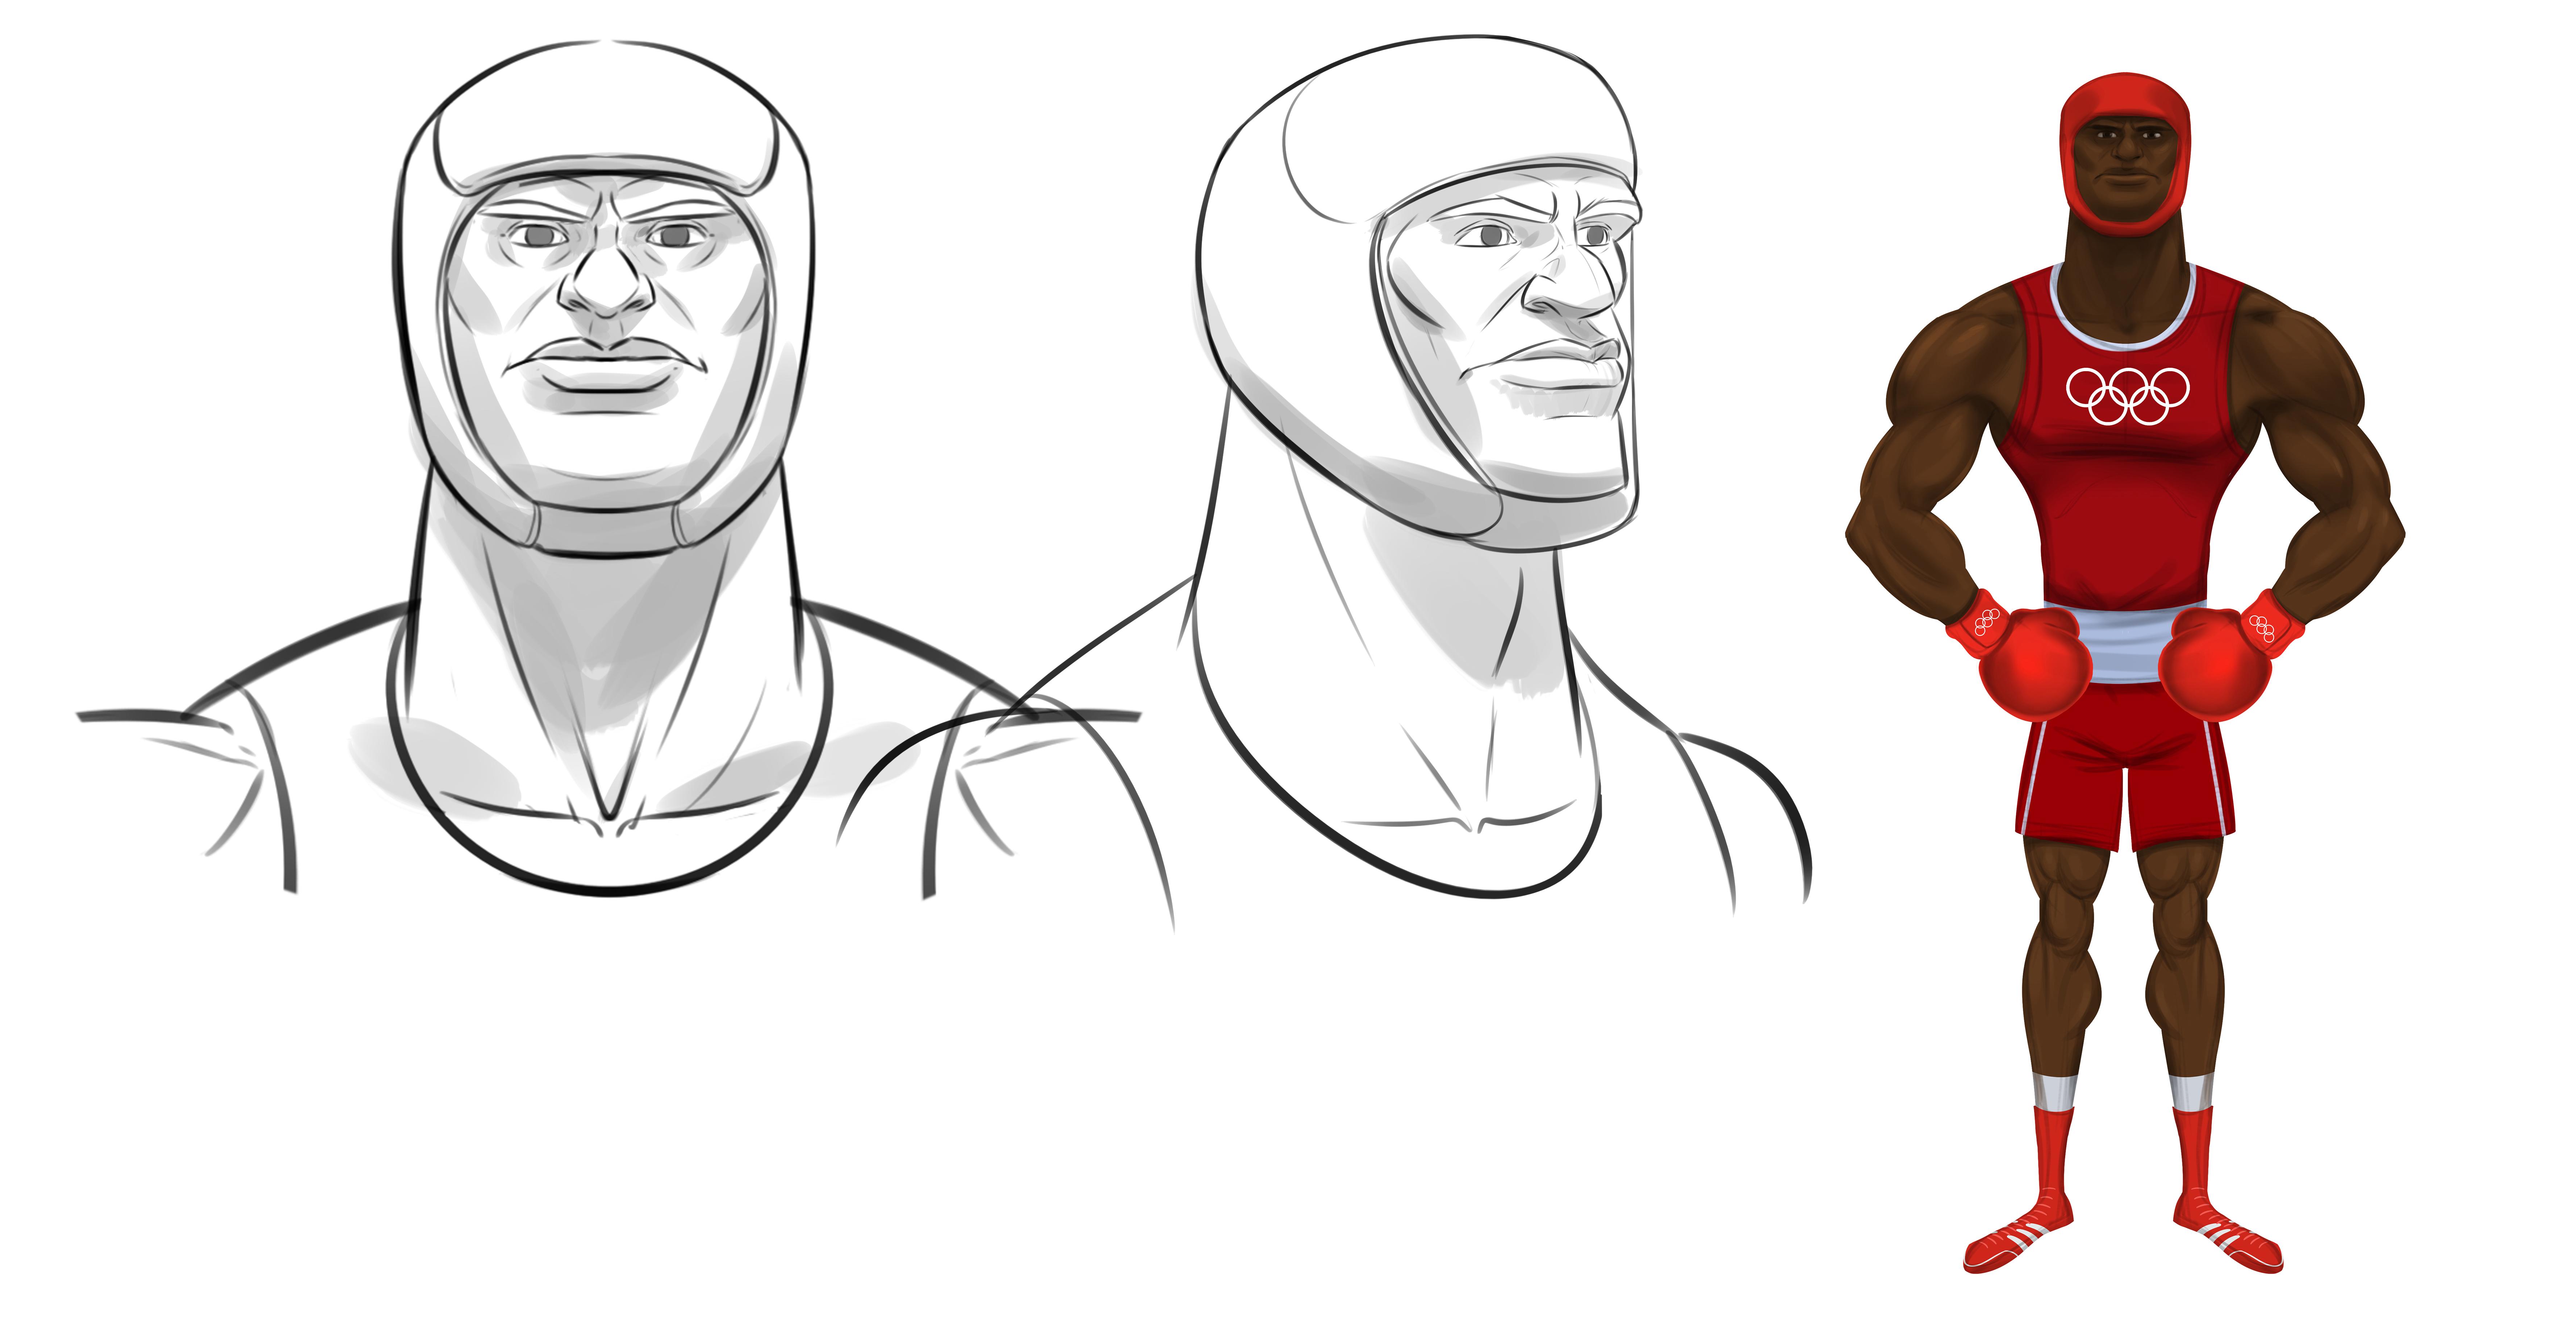 ROTACION BOXEADOR head v1